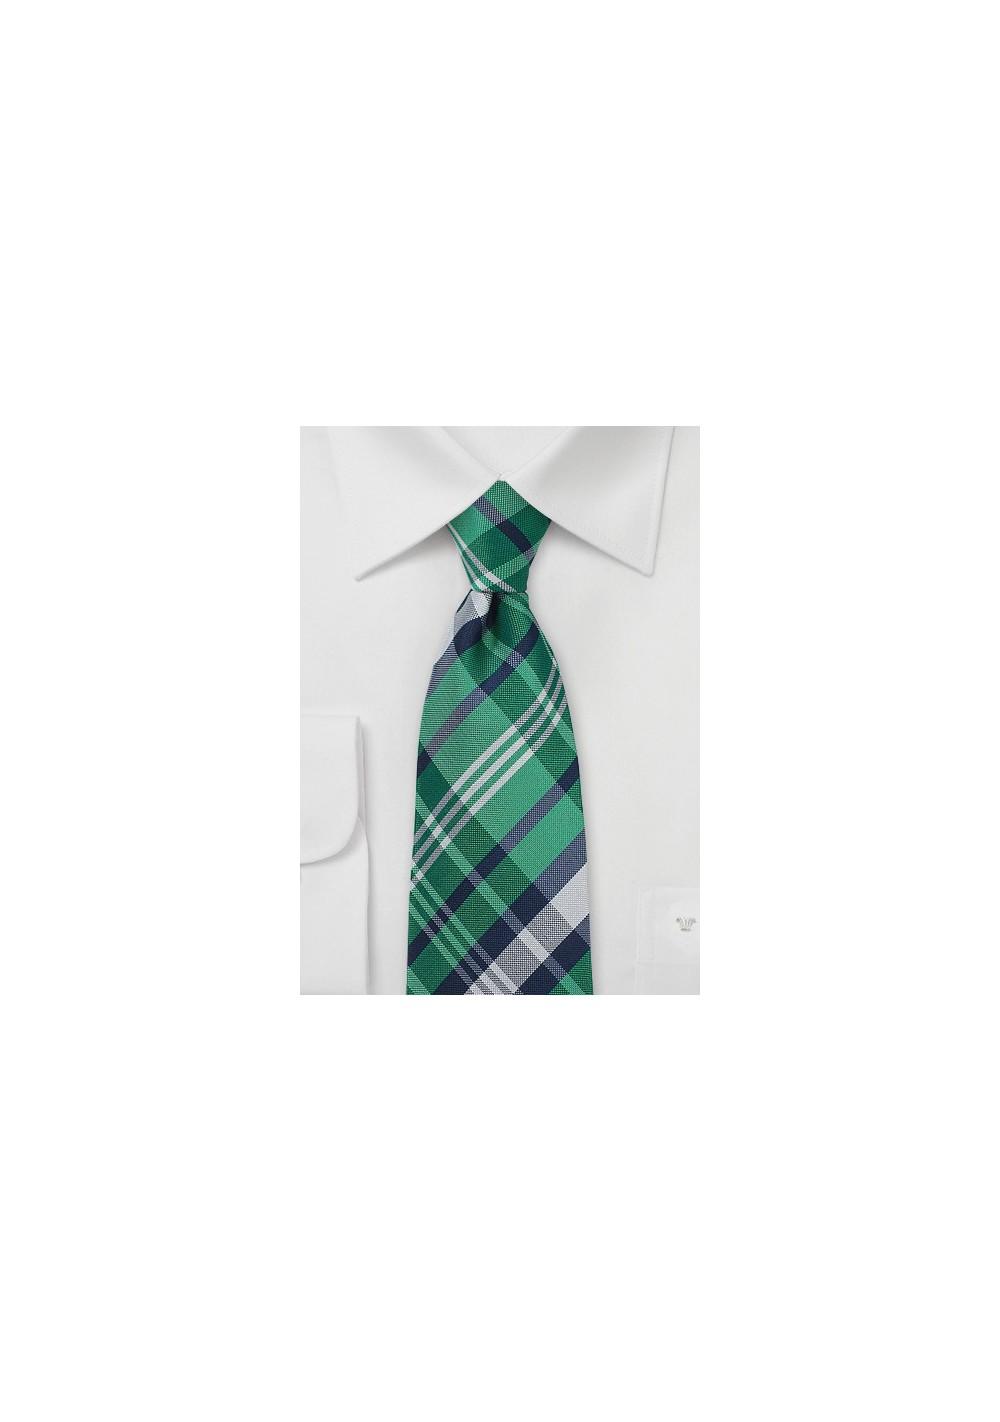 Scottish Tartan Plaid Tie in Green and Navy